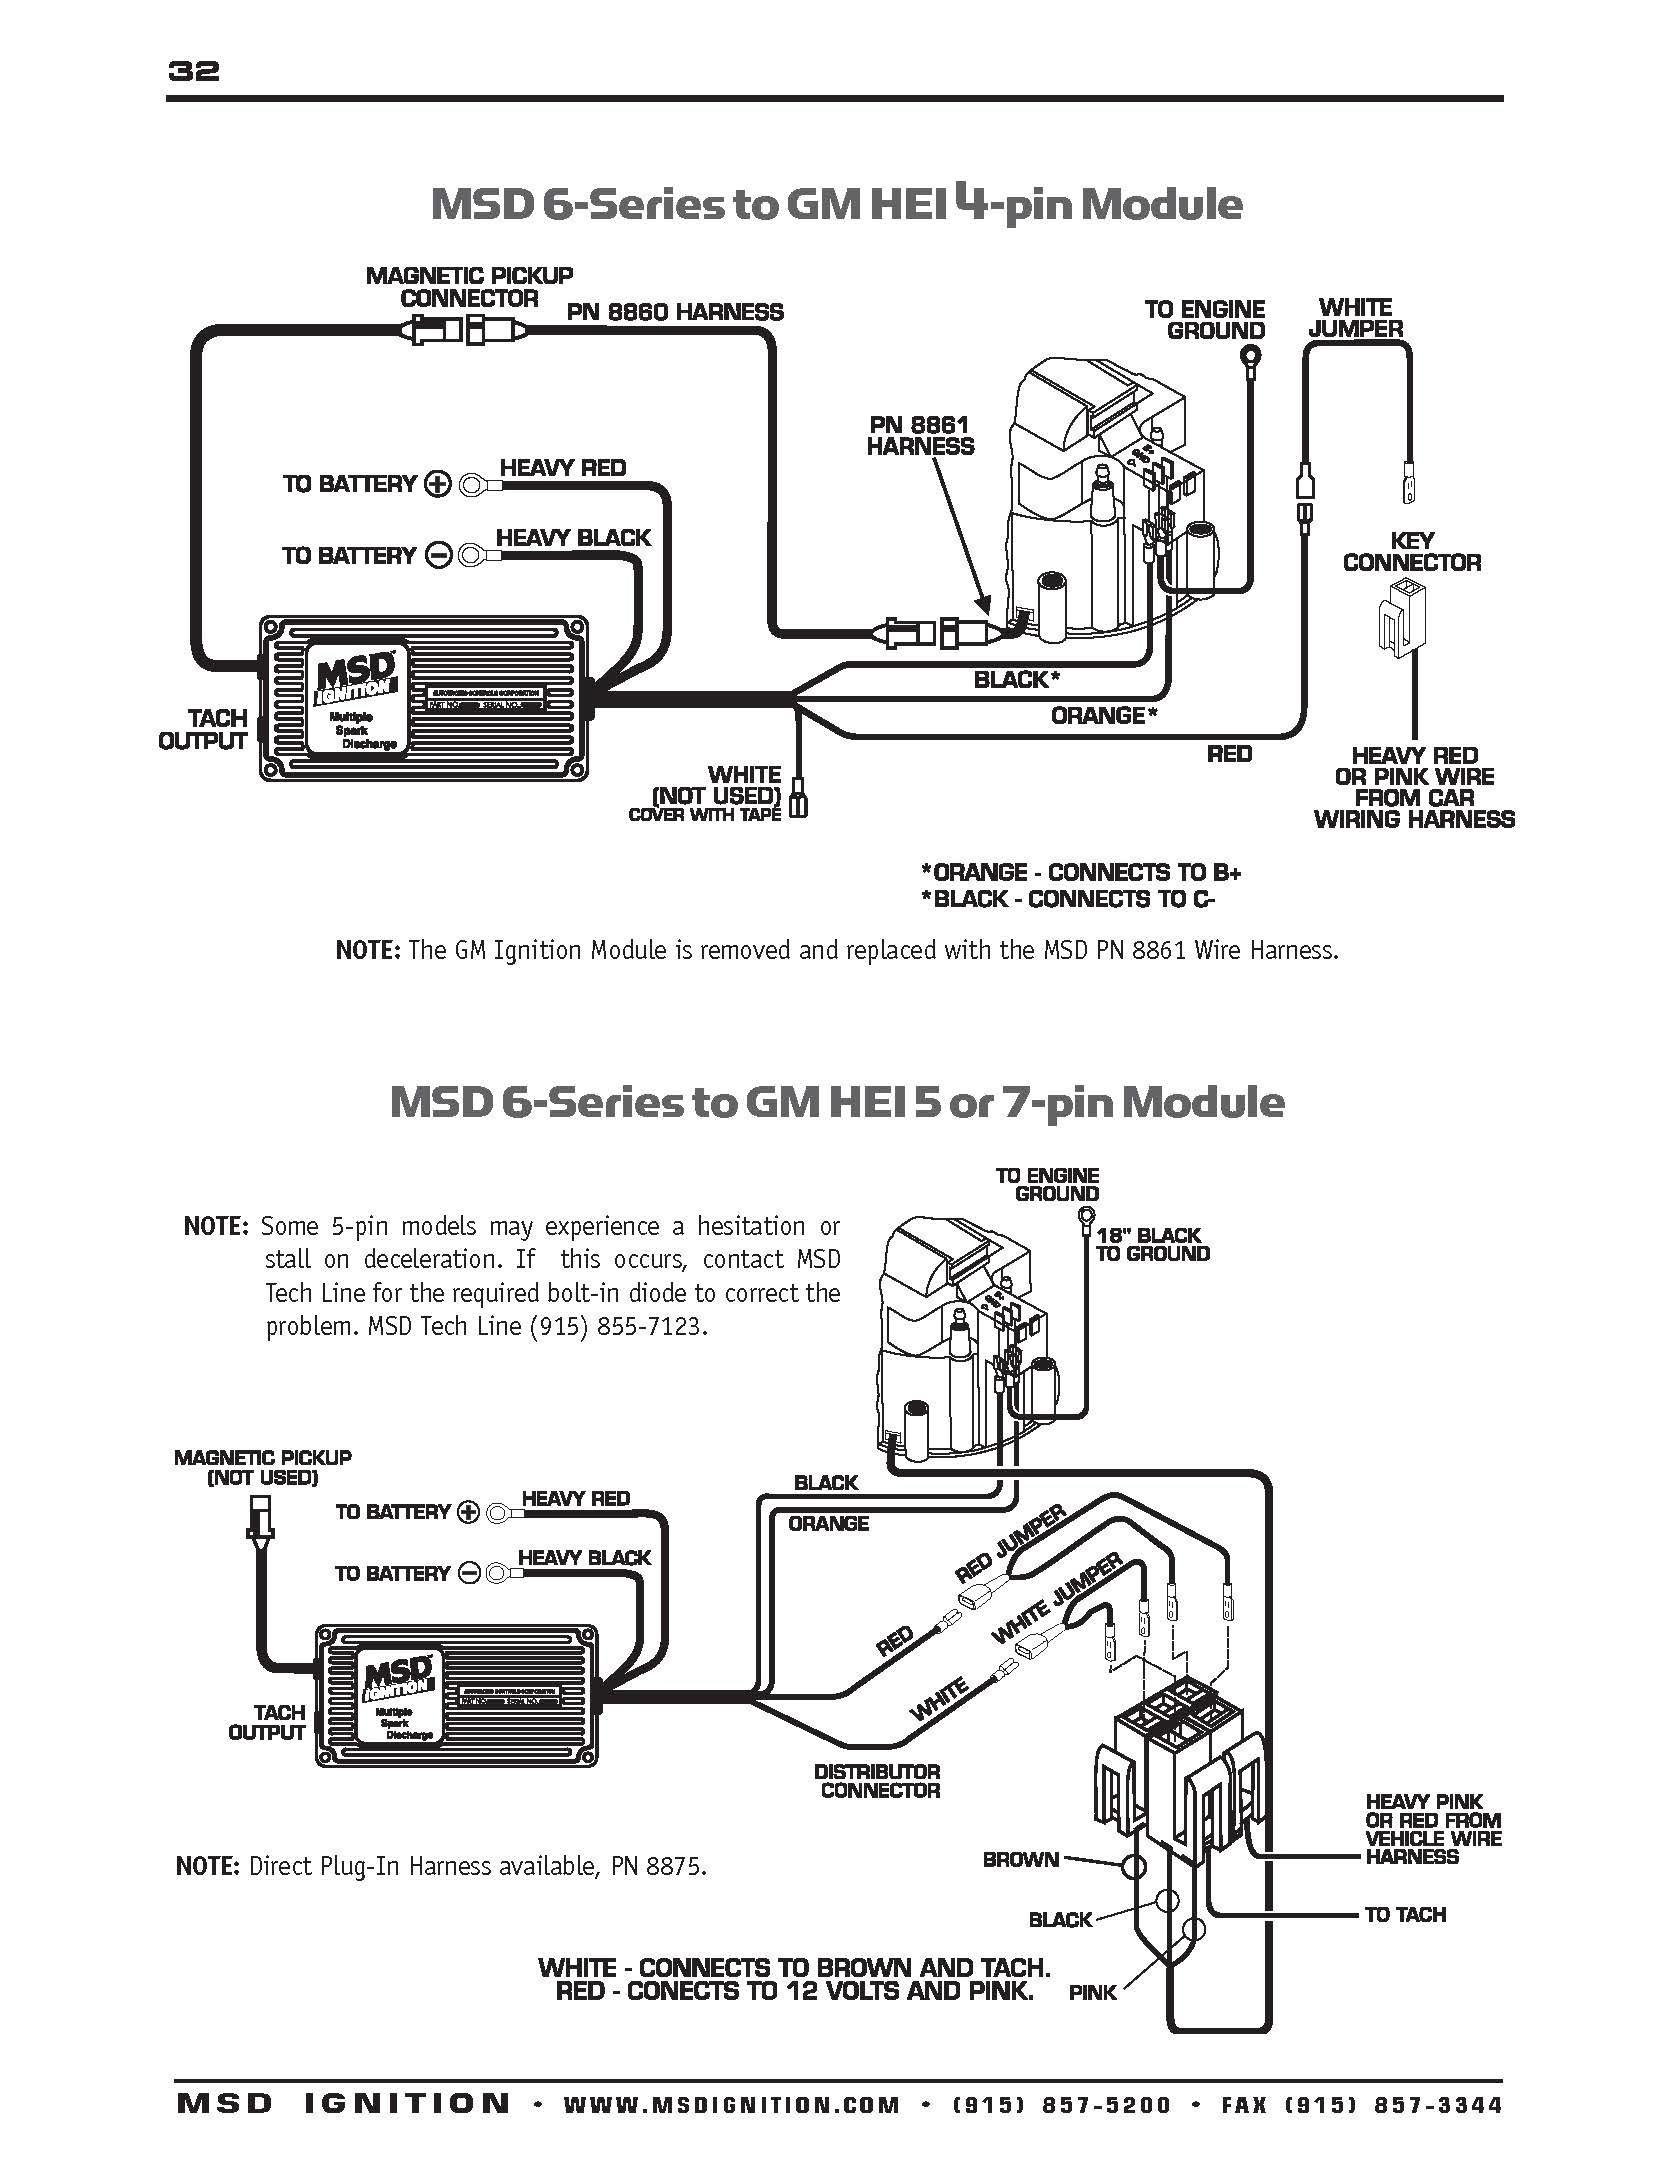 msd 6al wiring diagram Collection-Msd 6Al To Hei Wiring Diagram At A 6al Box 9-q